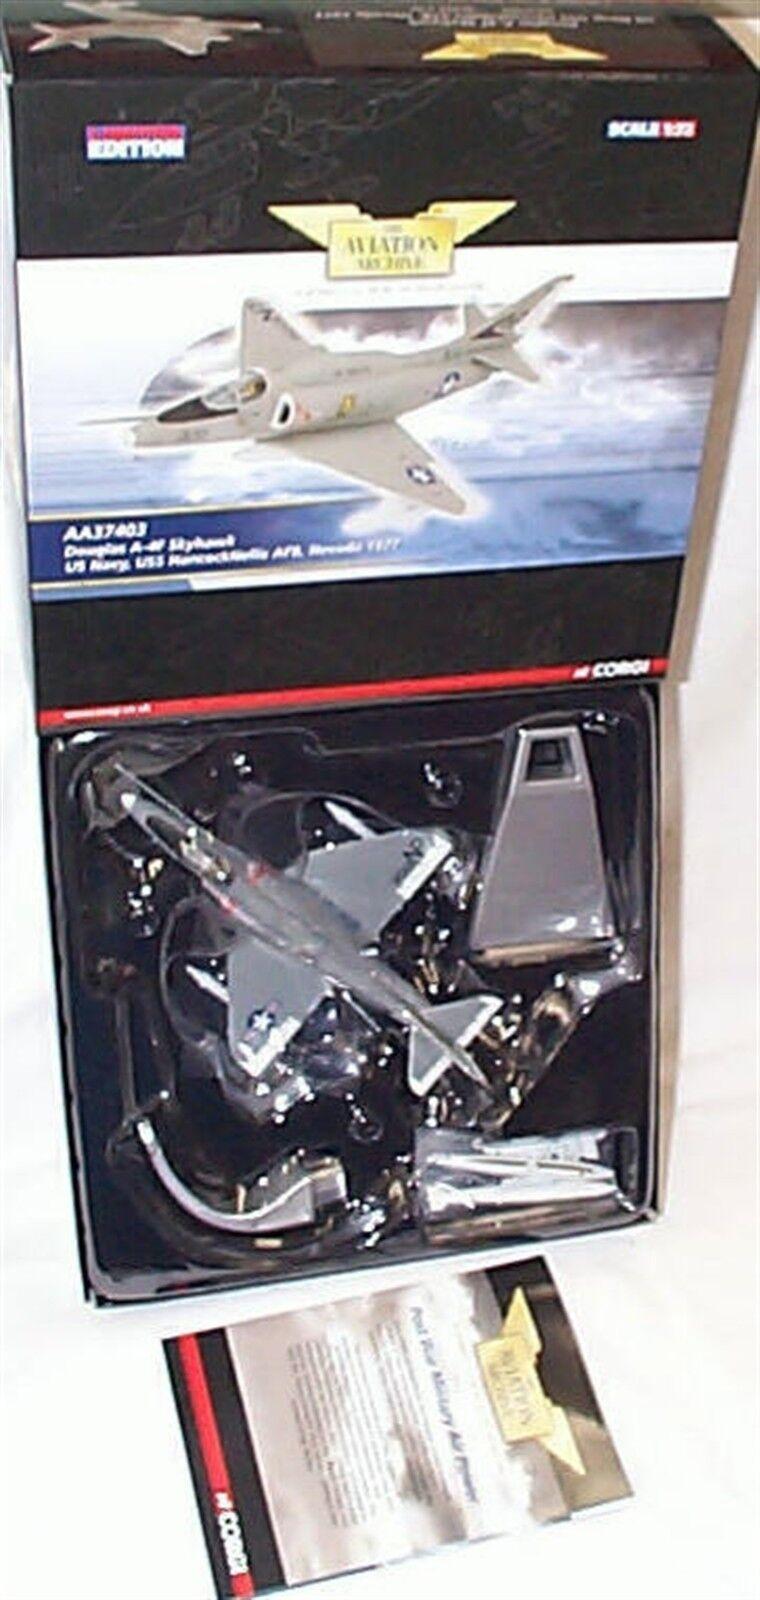 Douglas A-4F Skyhawk Us Nevada 1977 Corgi 1-72 scale aa37403 New in Box Ltd Ed